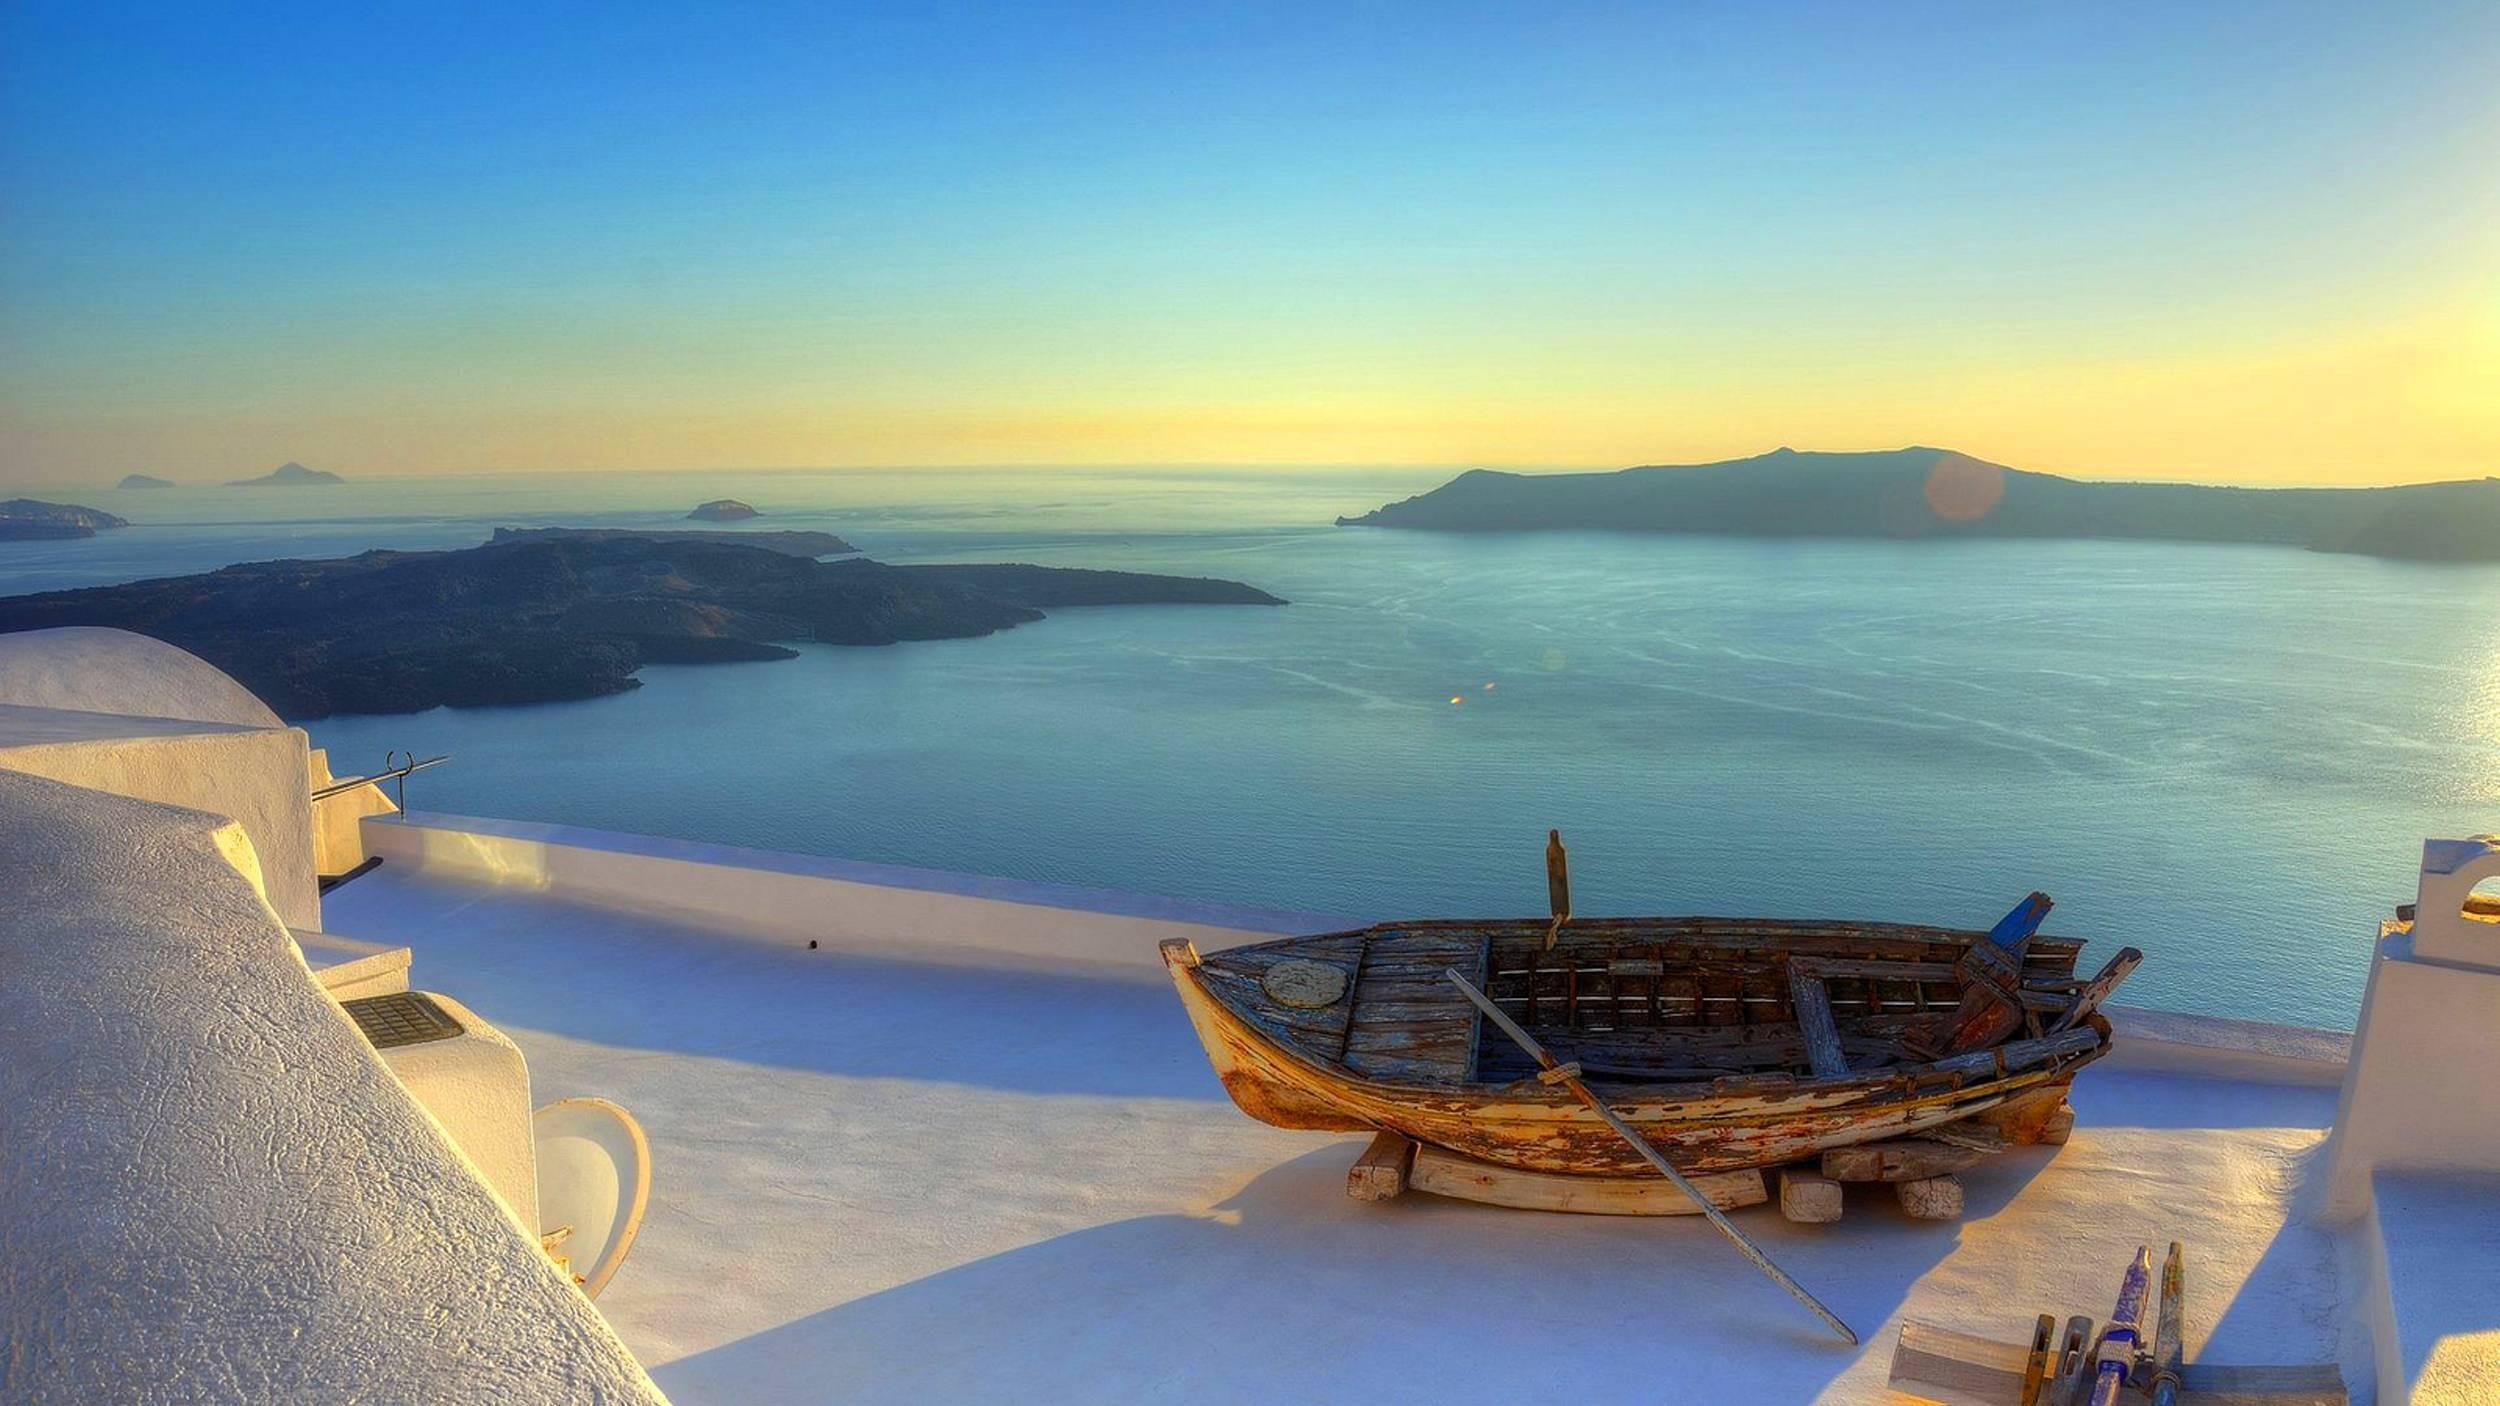 greece images photos